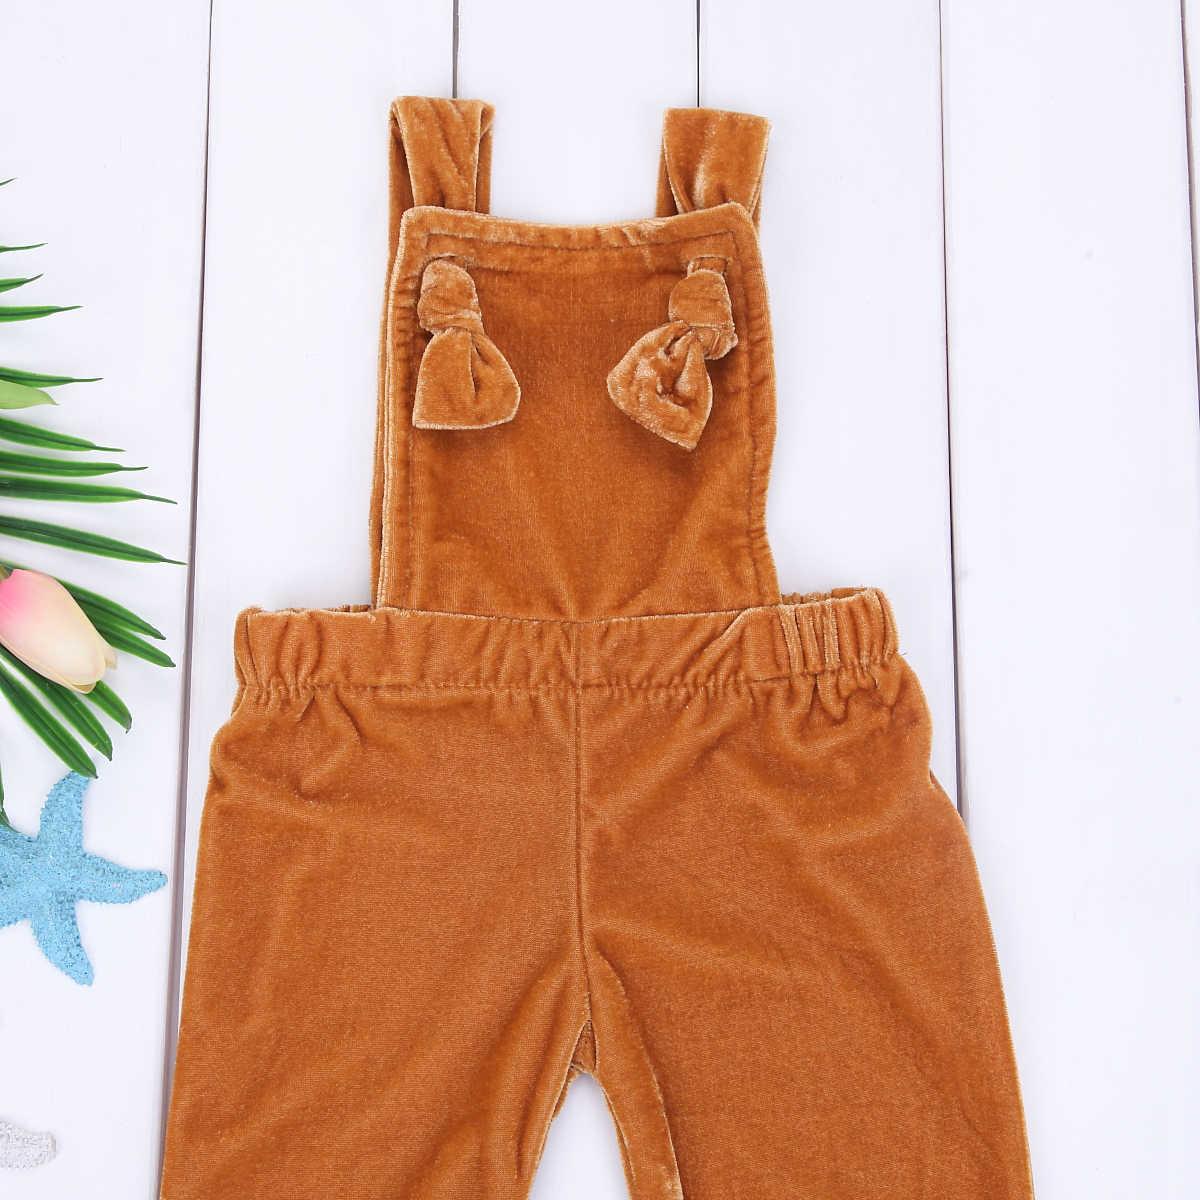 2018 nueva moda niñas traje bastante bebé niño niña terciopelo babero pantalones chico bebé Niñas Ropa